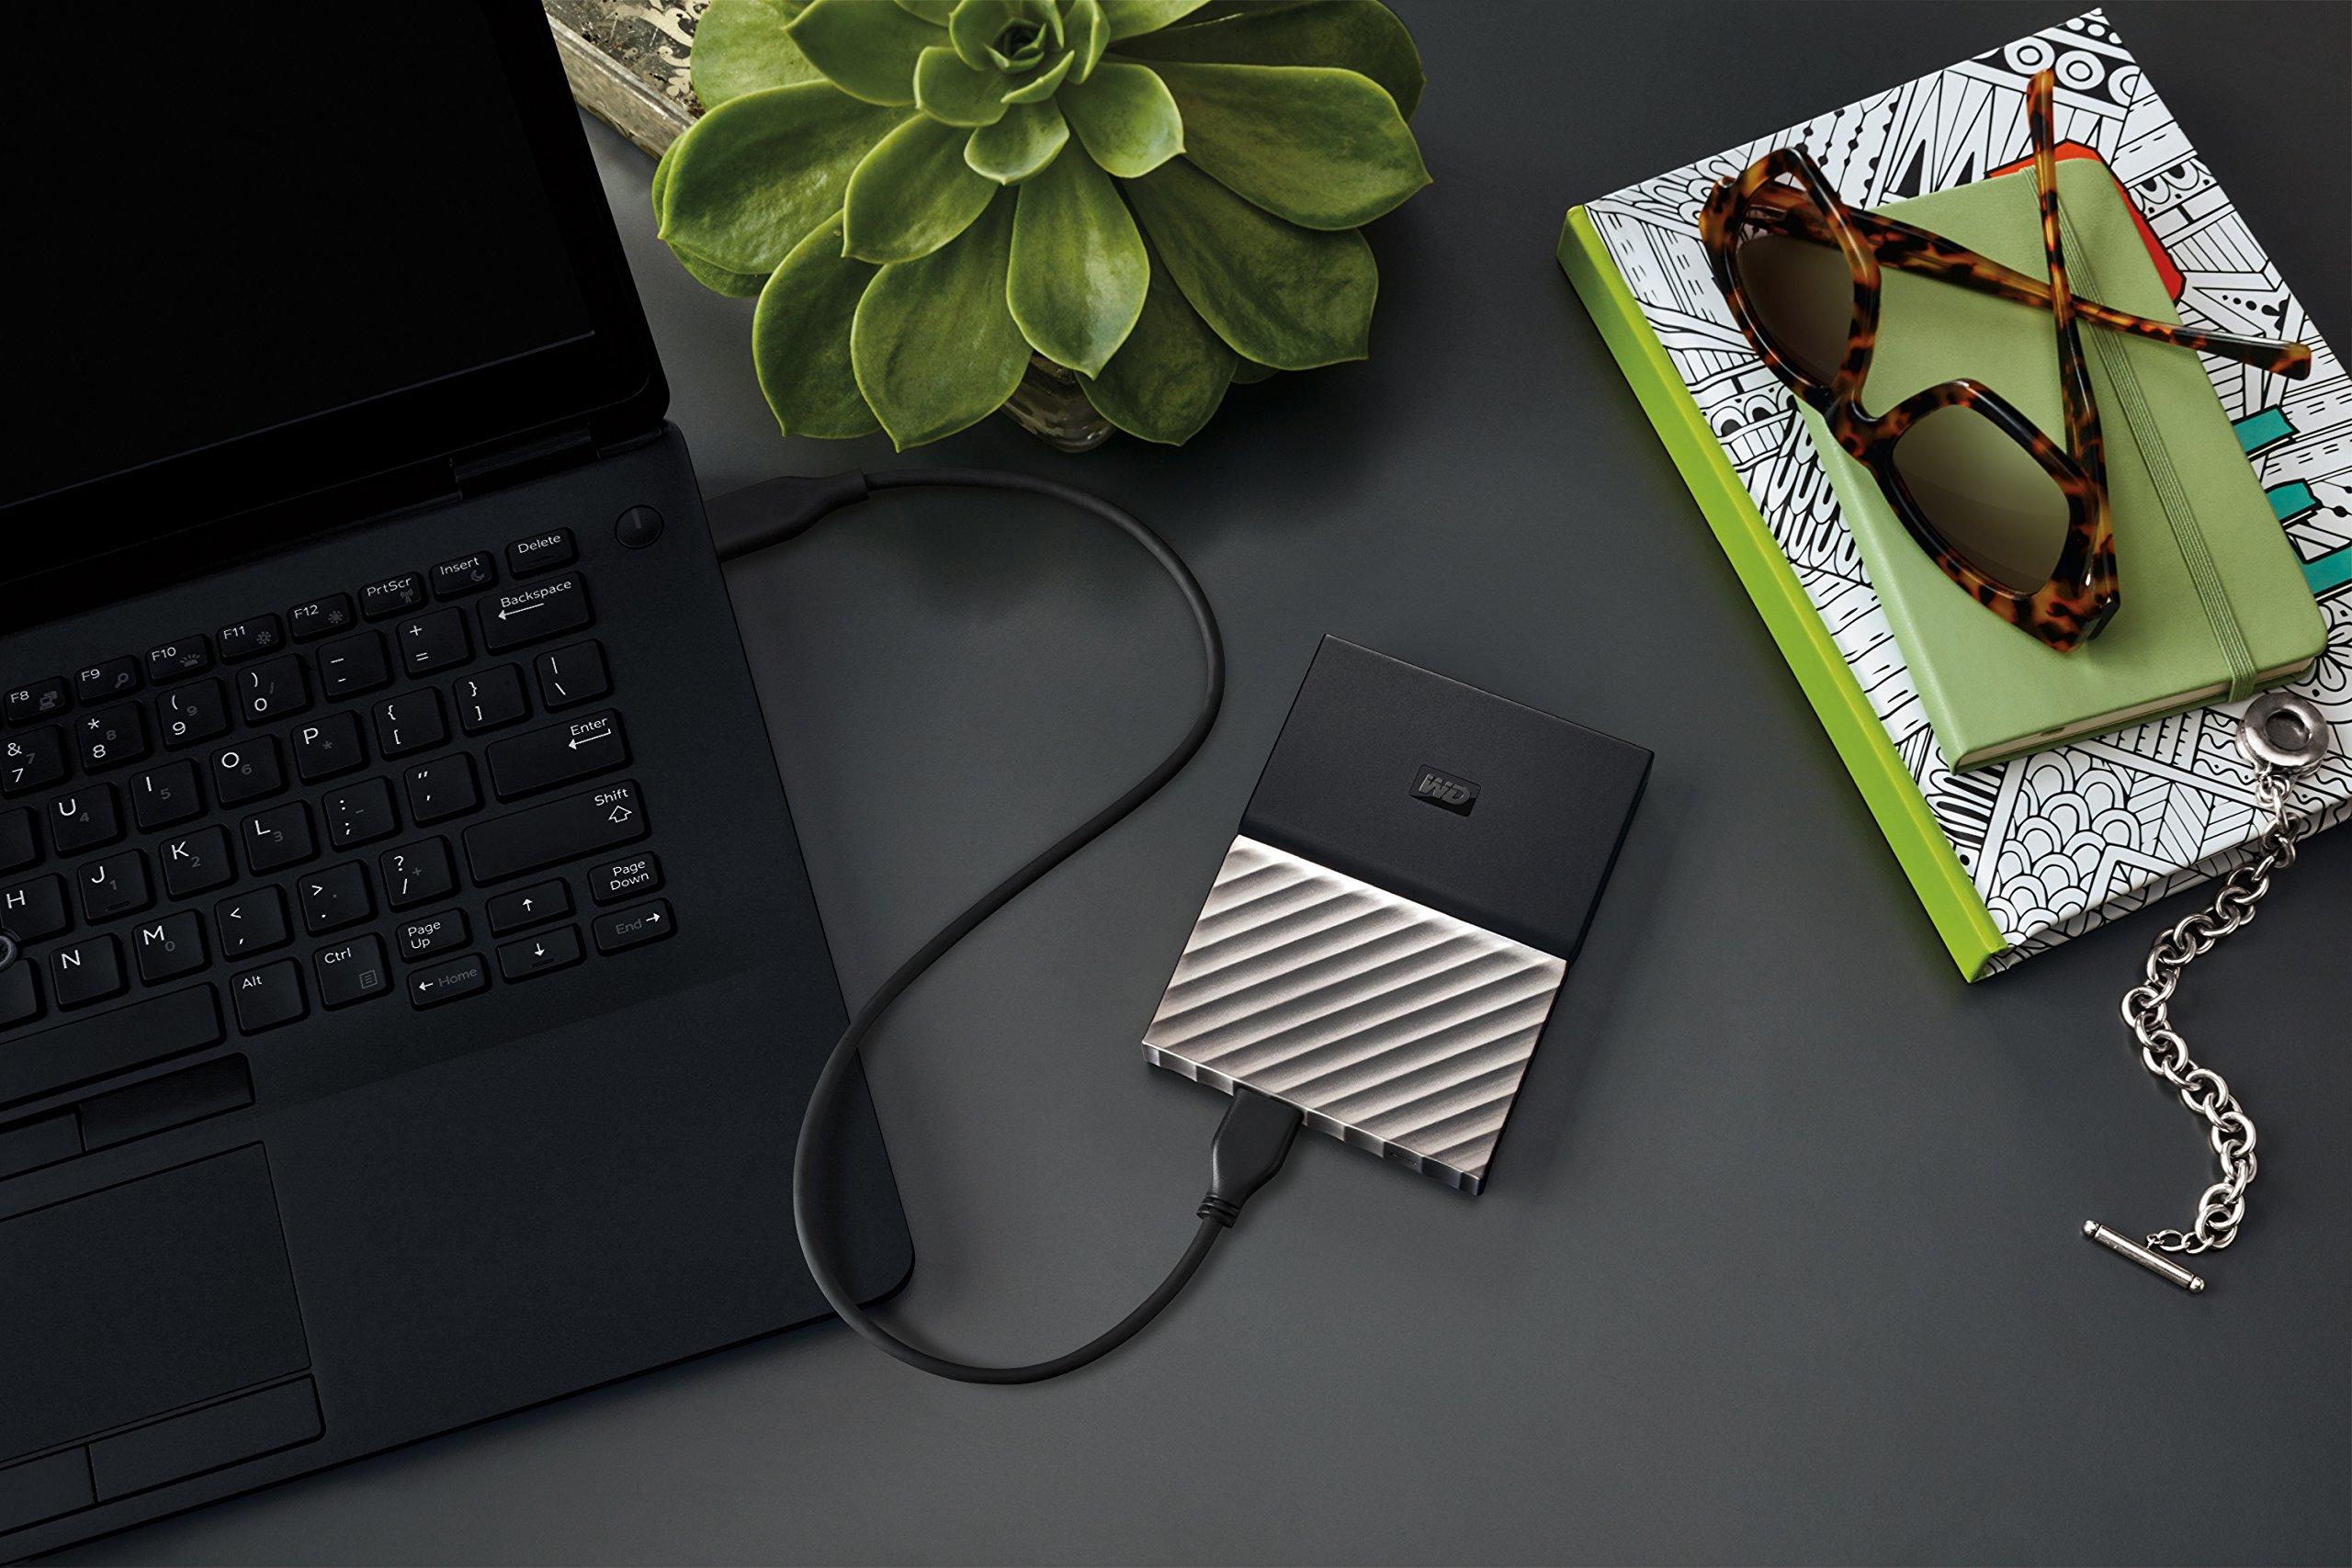 WD 1TB Black-Gray My Passport Ultra Portable External Hard Drive - USB 3.0 - WDBTLG0010BGY-WESN (Old Generation) by Western Digital (Image #5)